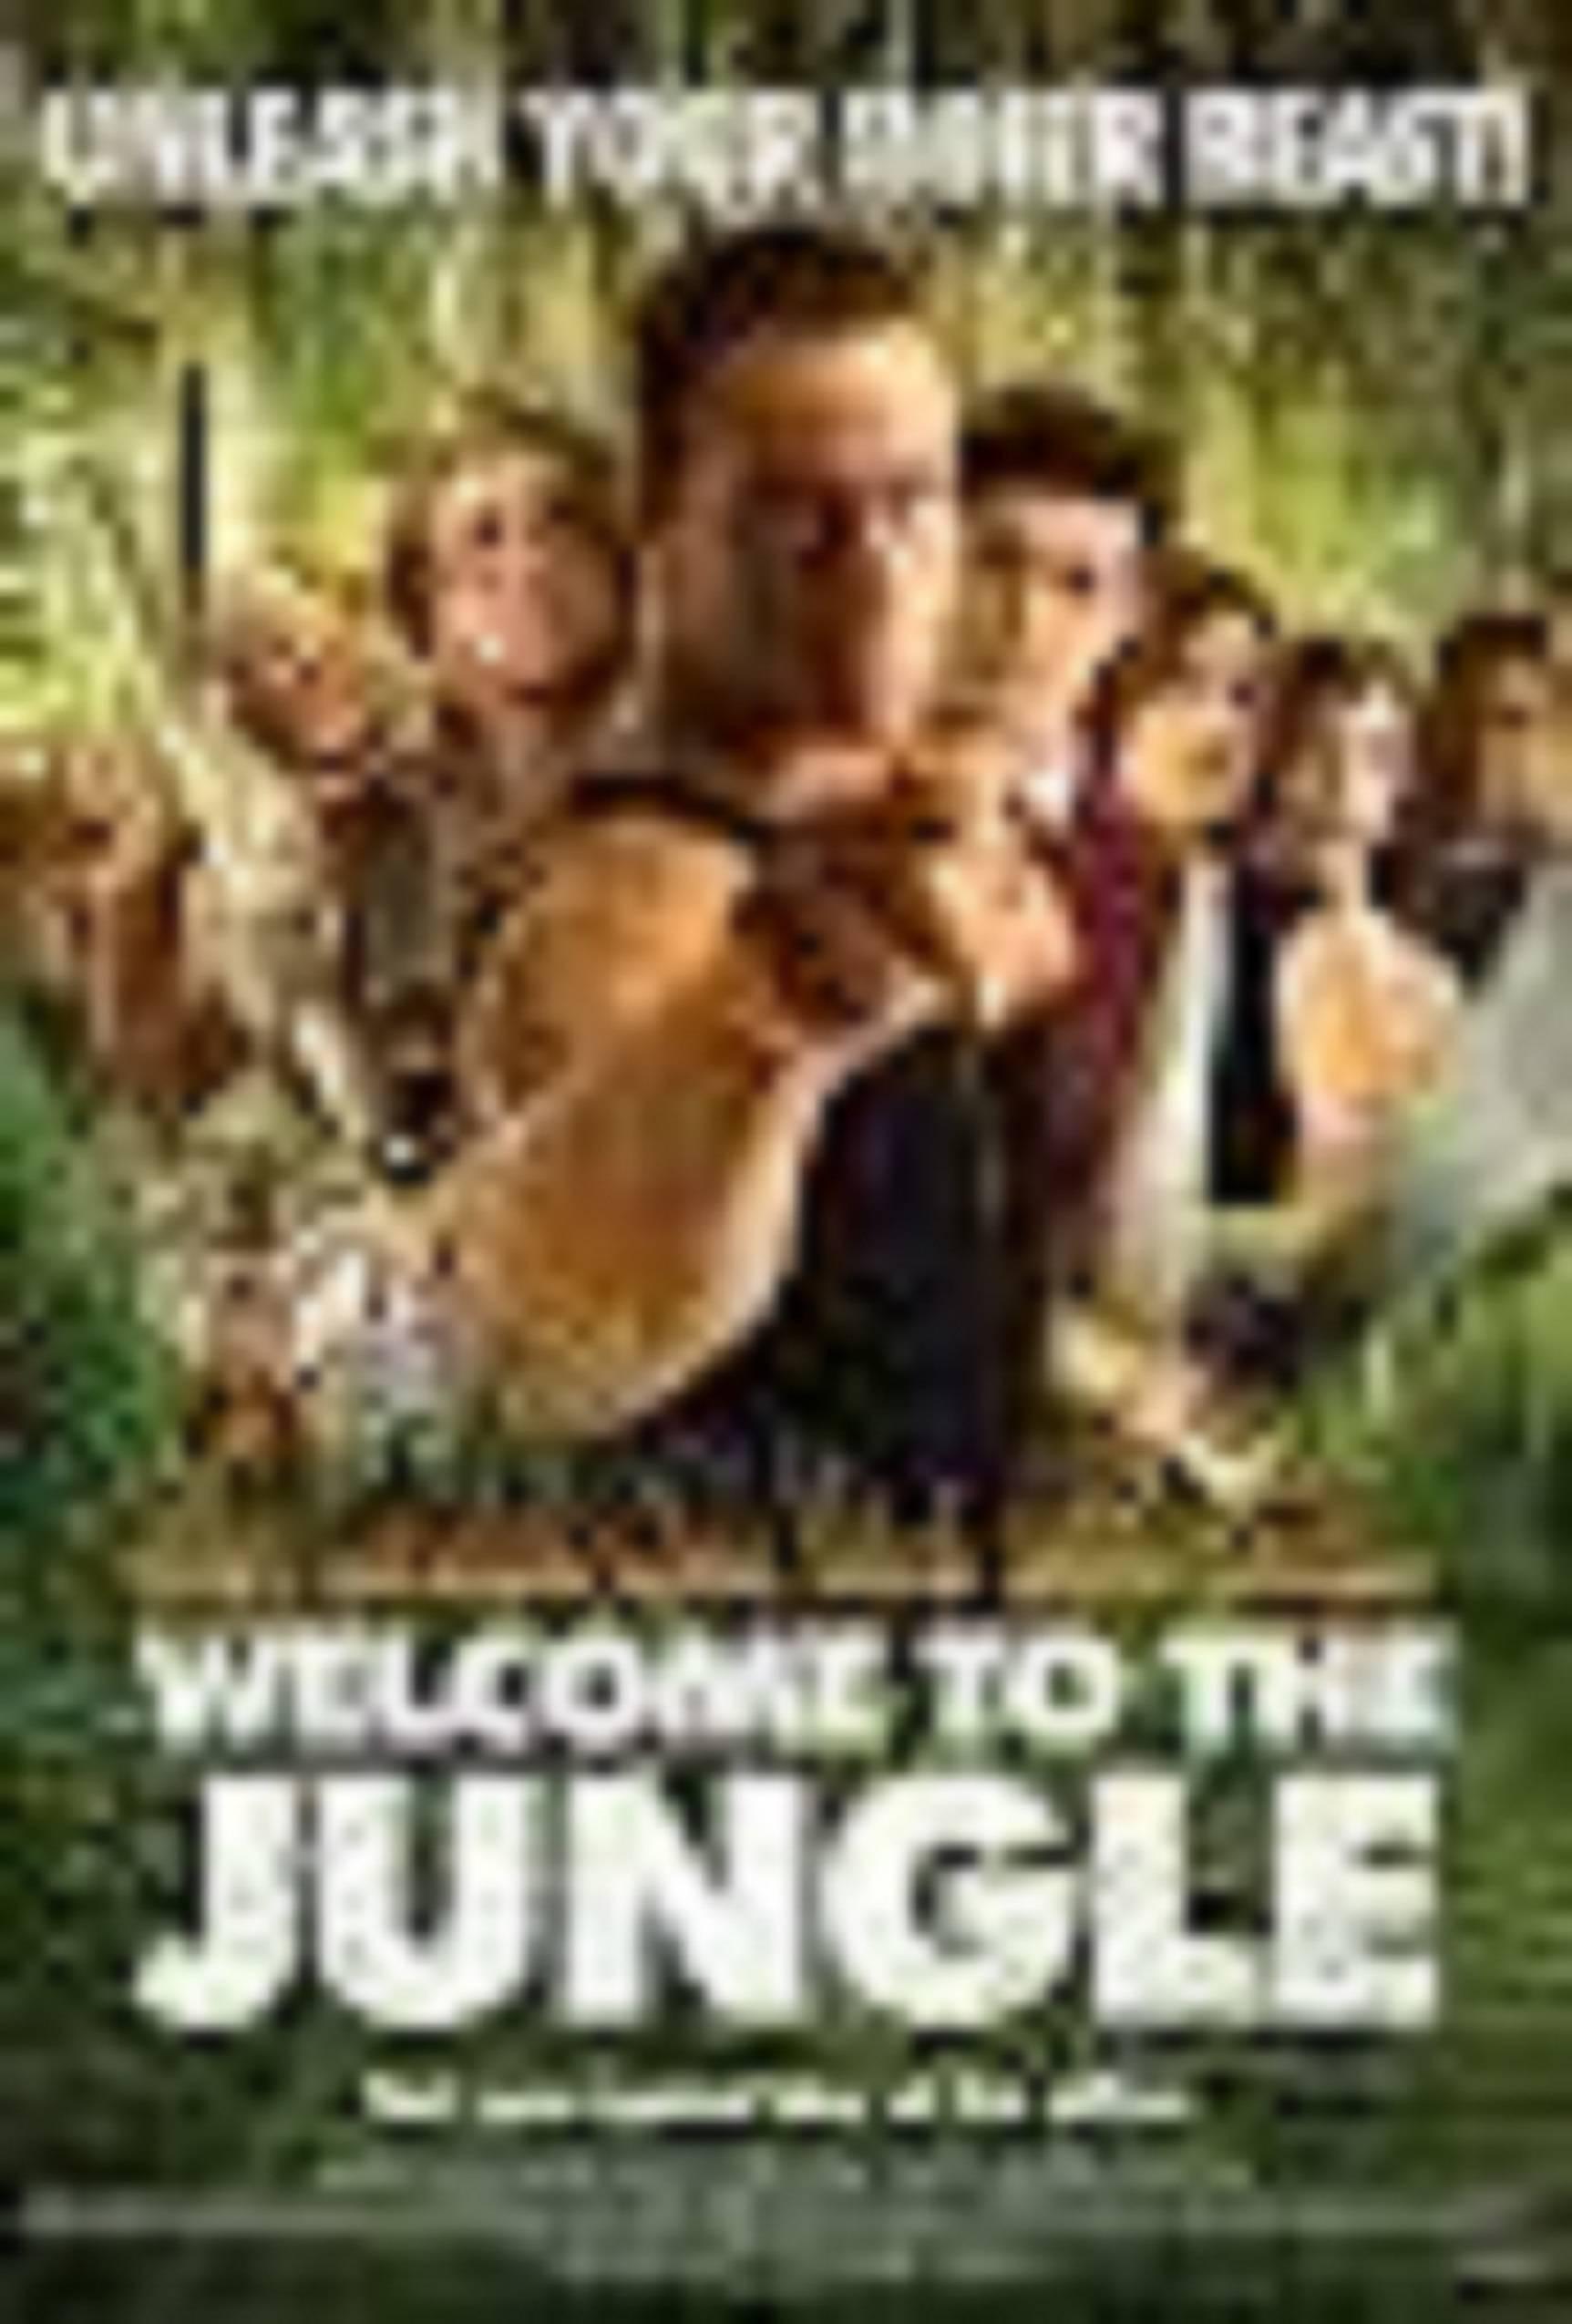 f496c9e73175455e819b_Welcome_to_the_Jungle.jpg